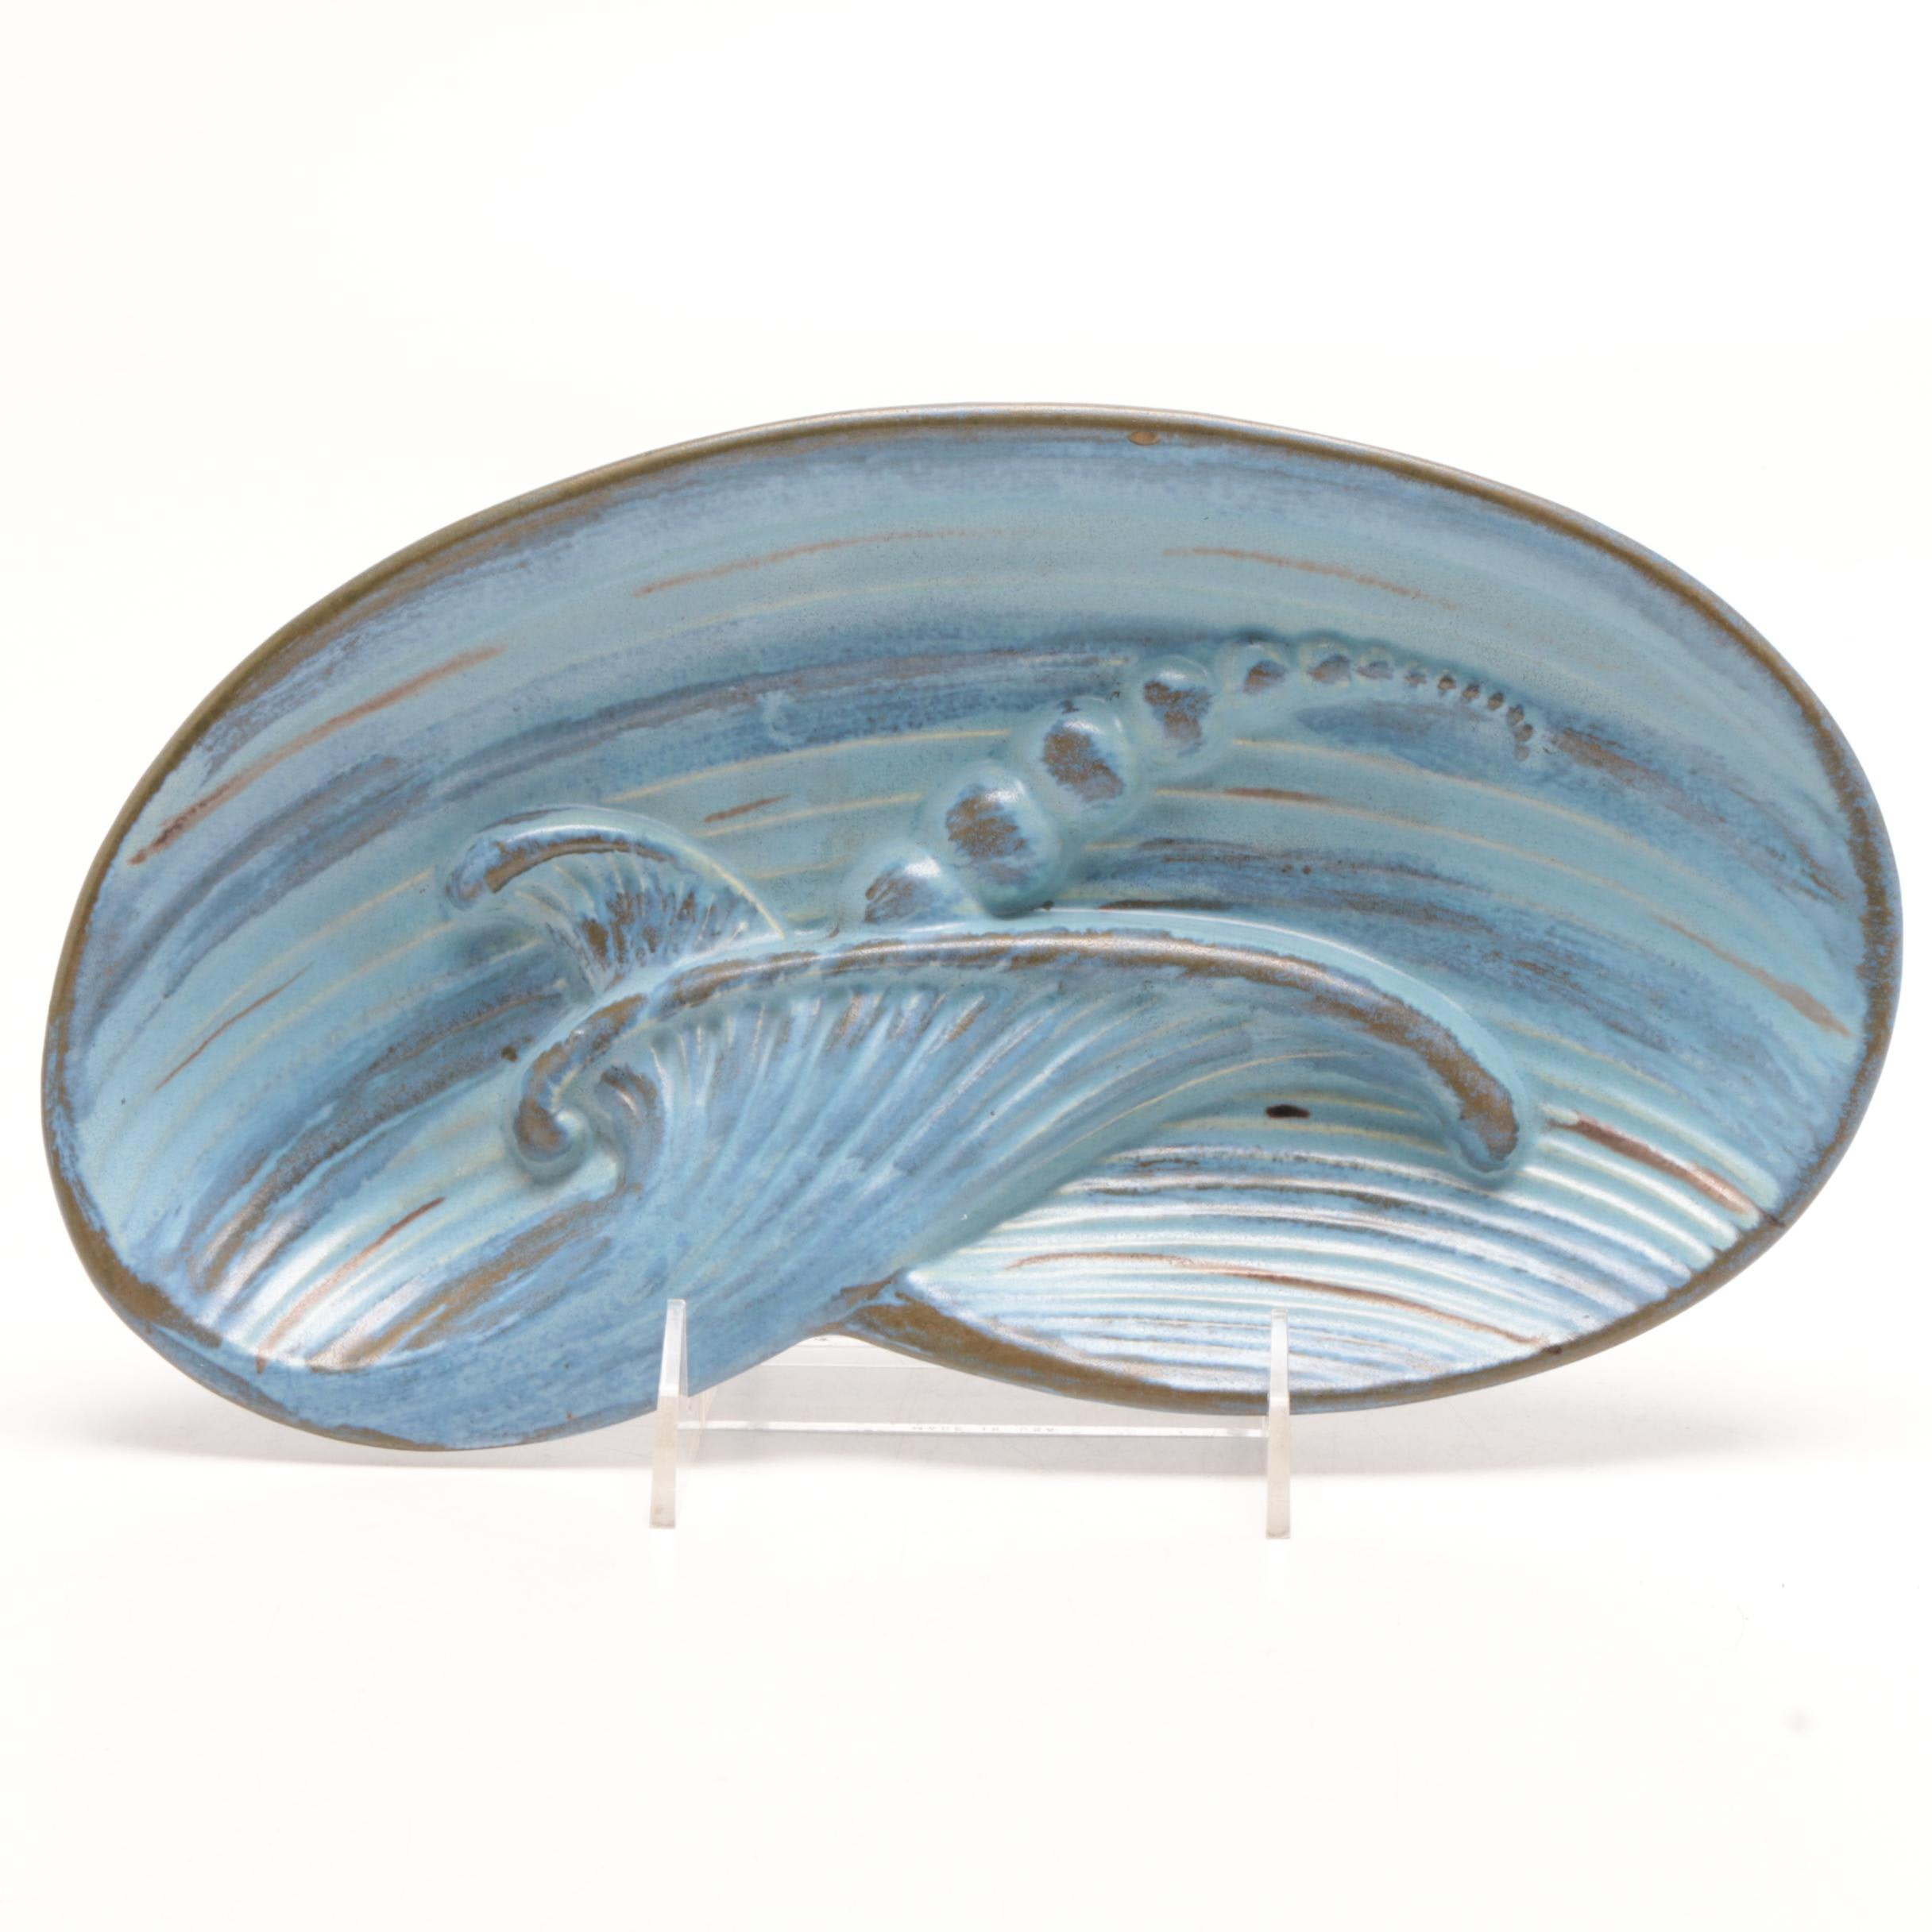 Haeger Art Deco Style Ash Receiver